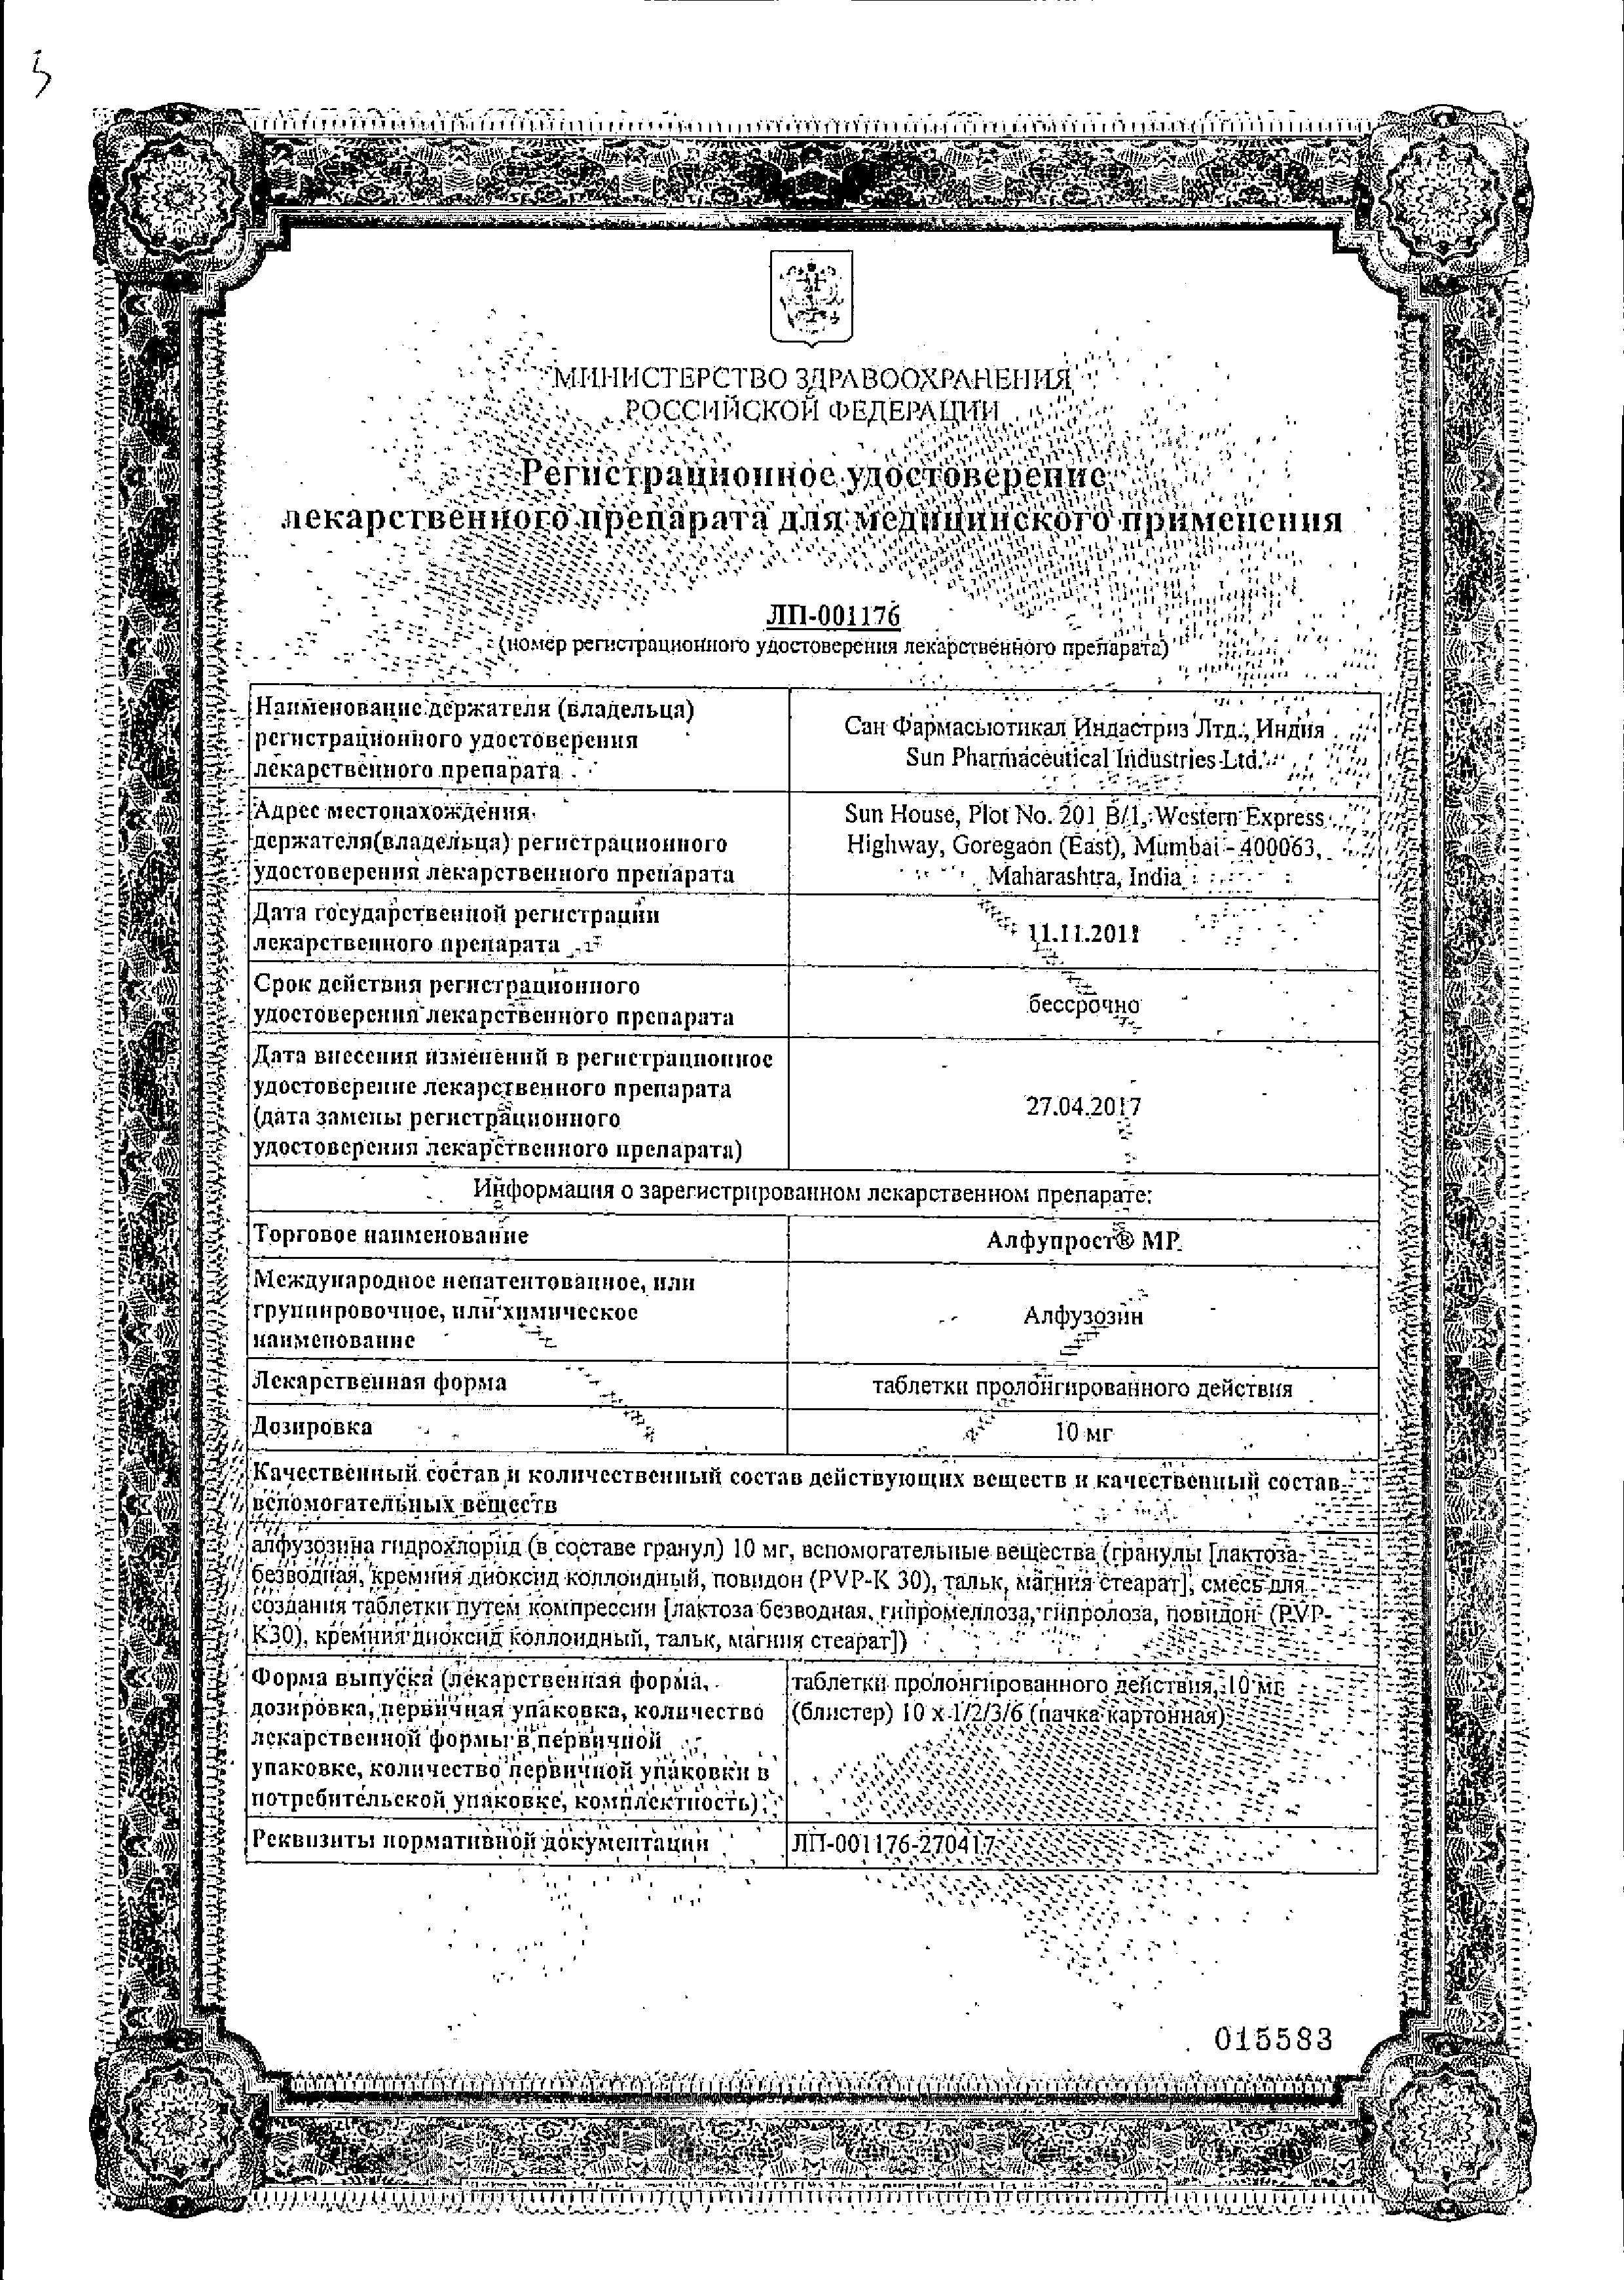 Алфупрост МР сертификат